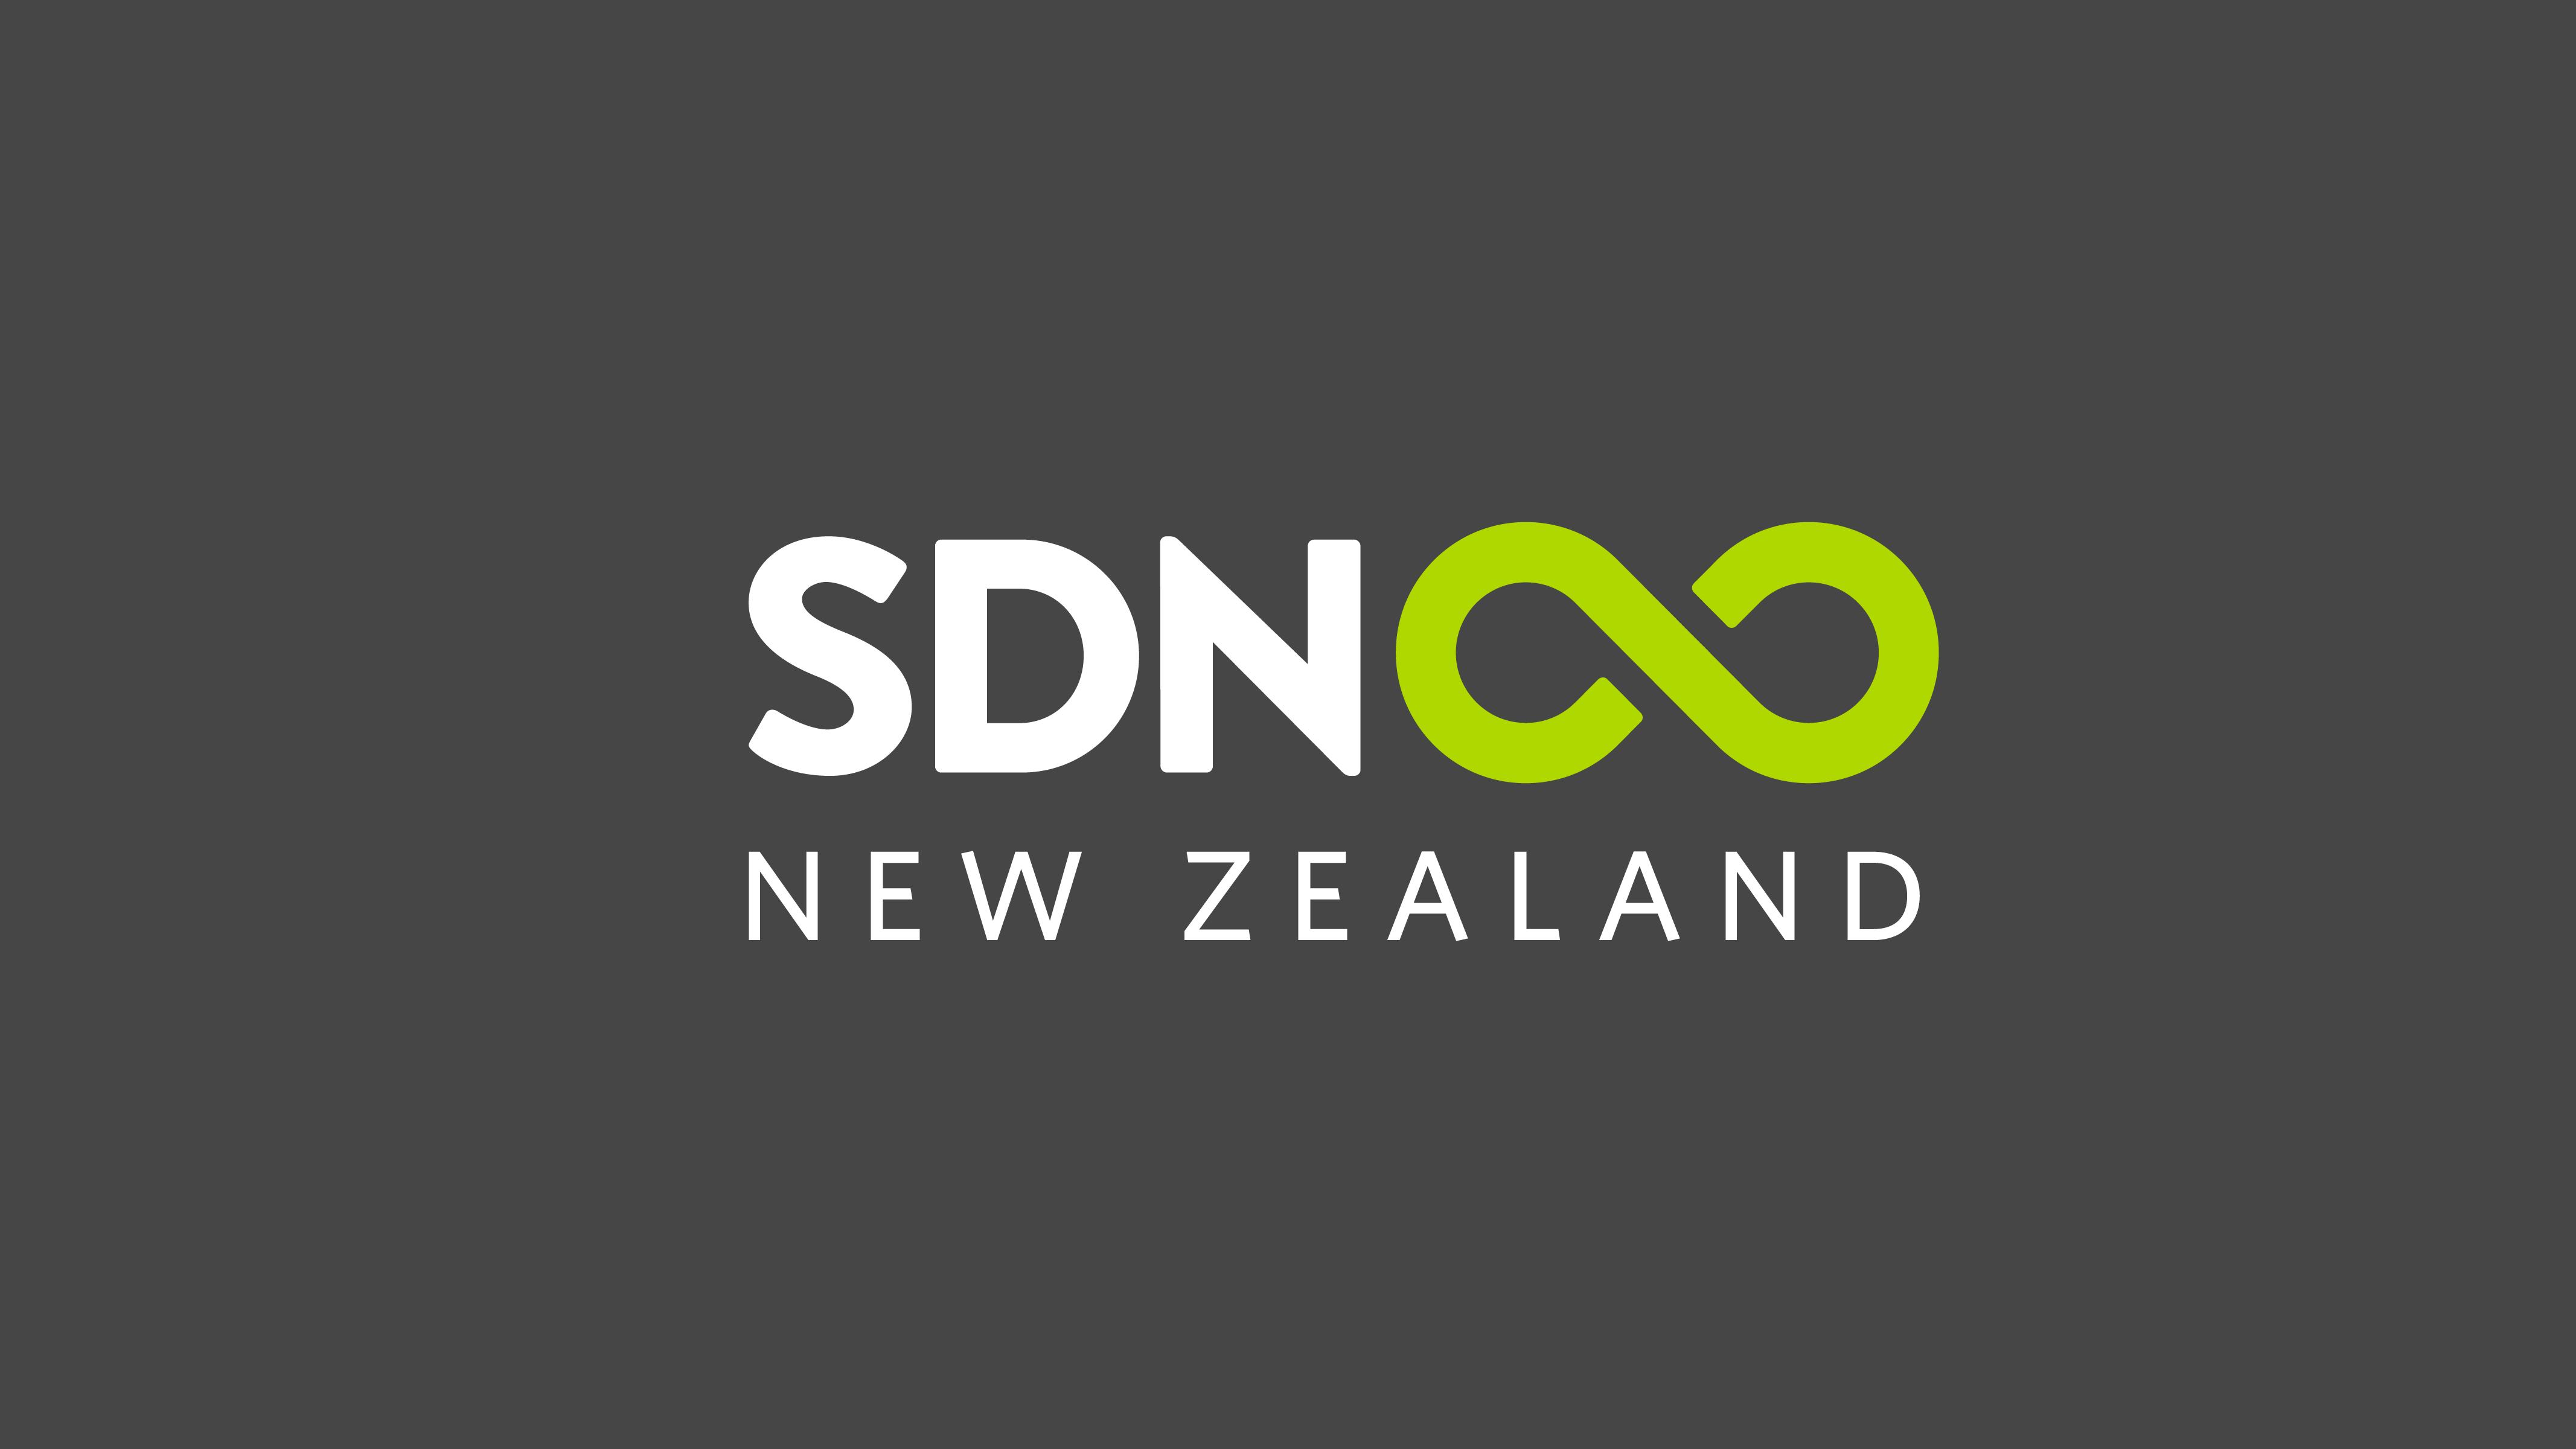 Service Design Network New Zealand